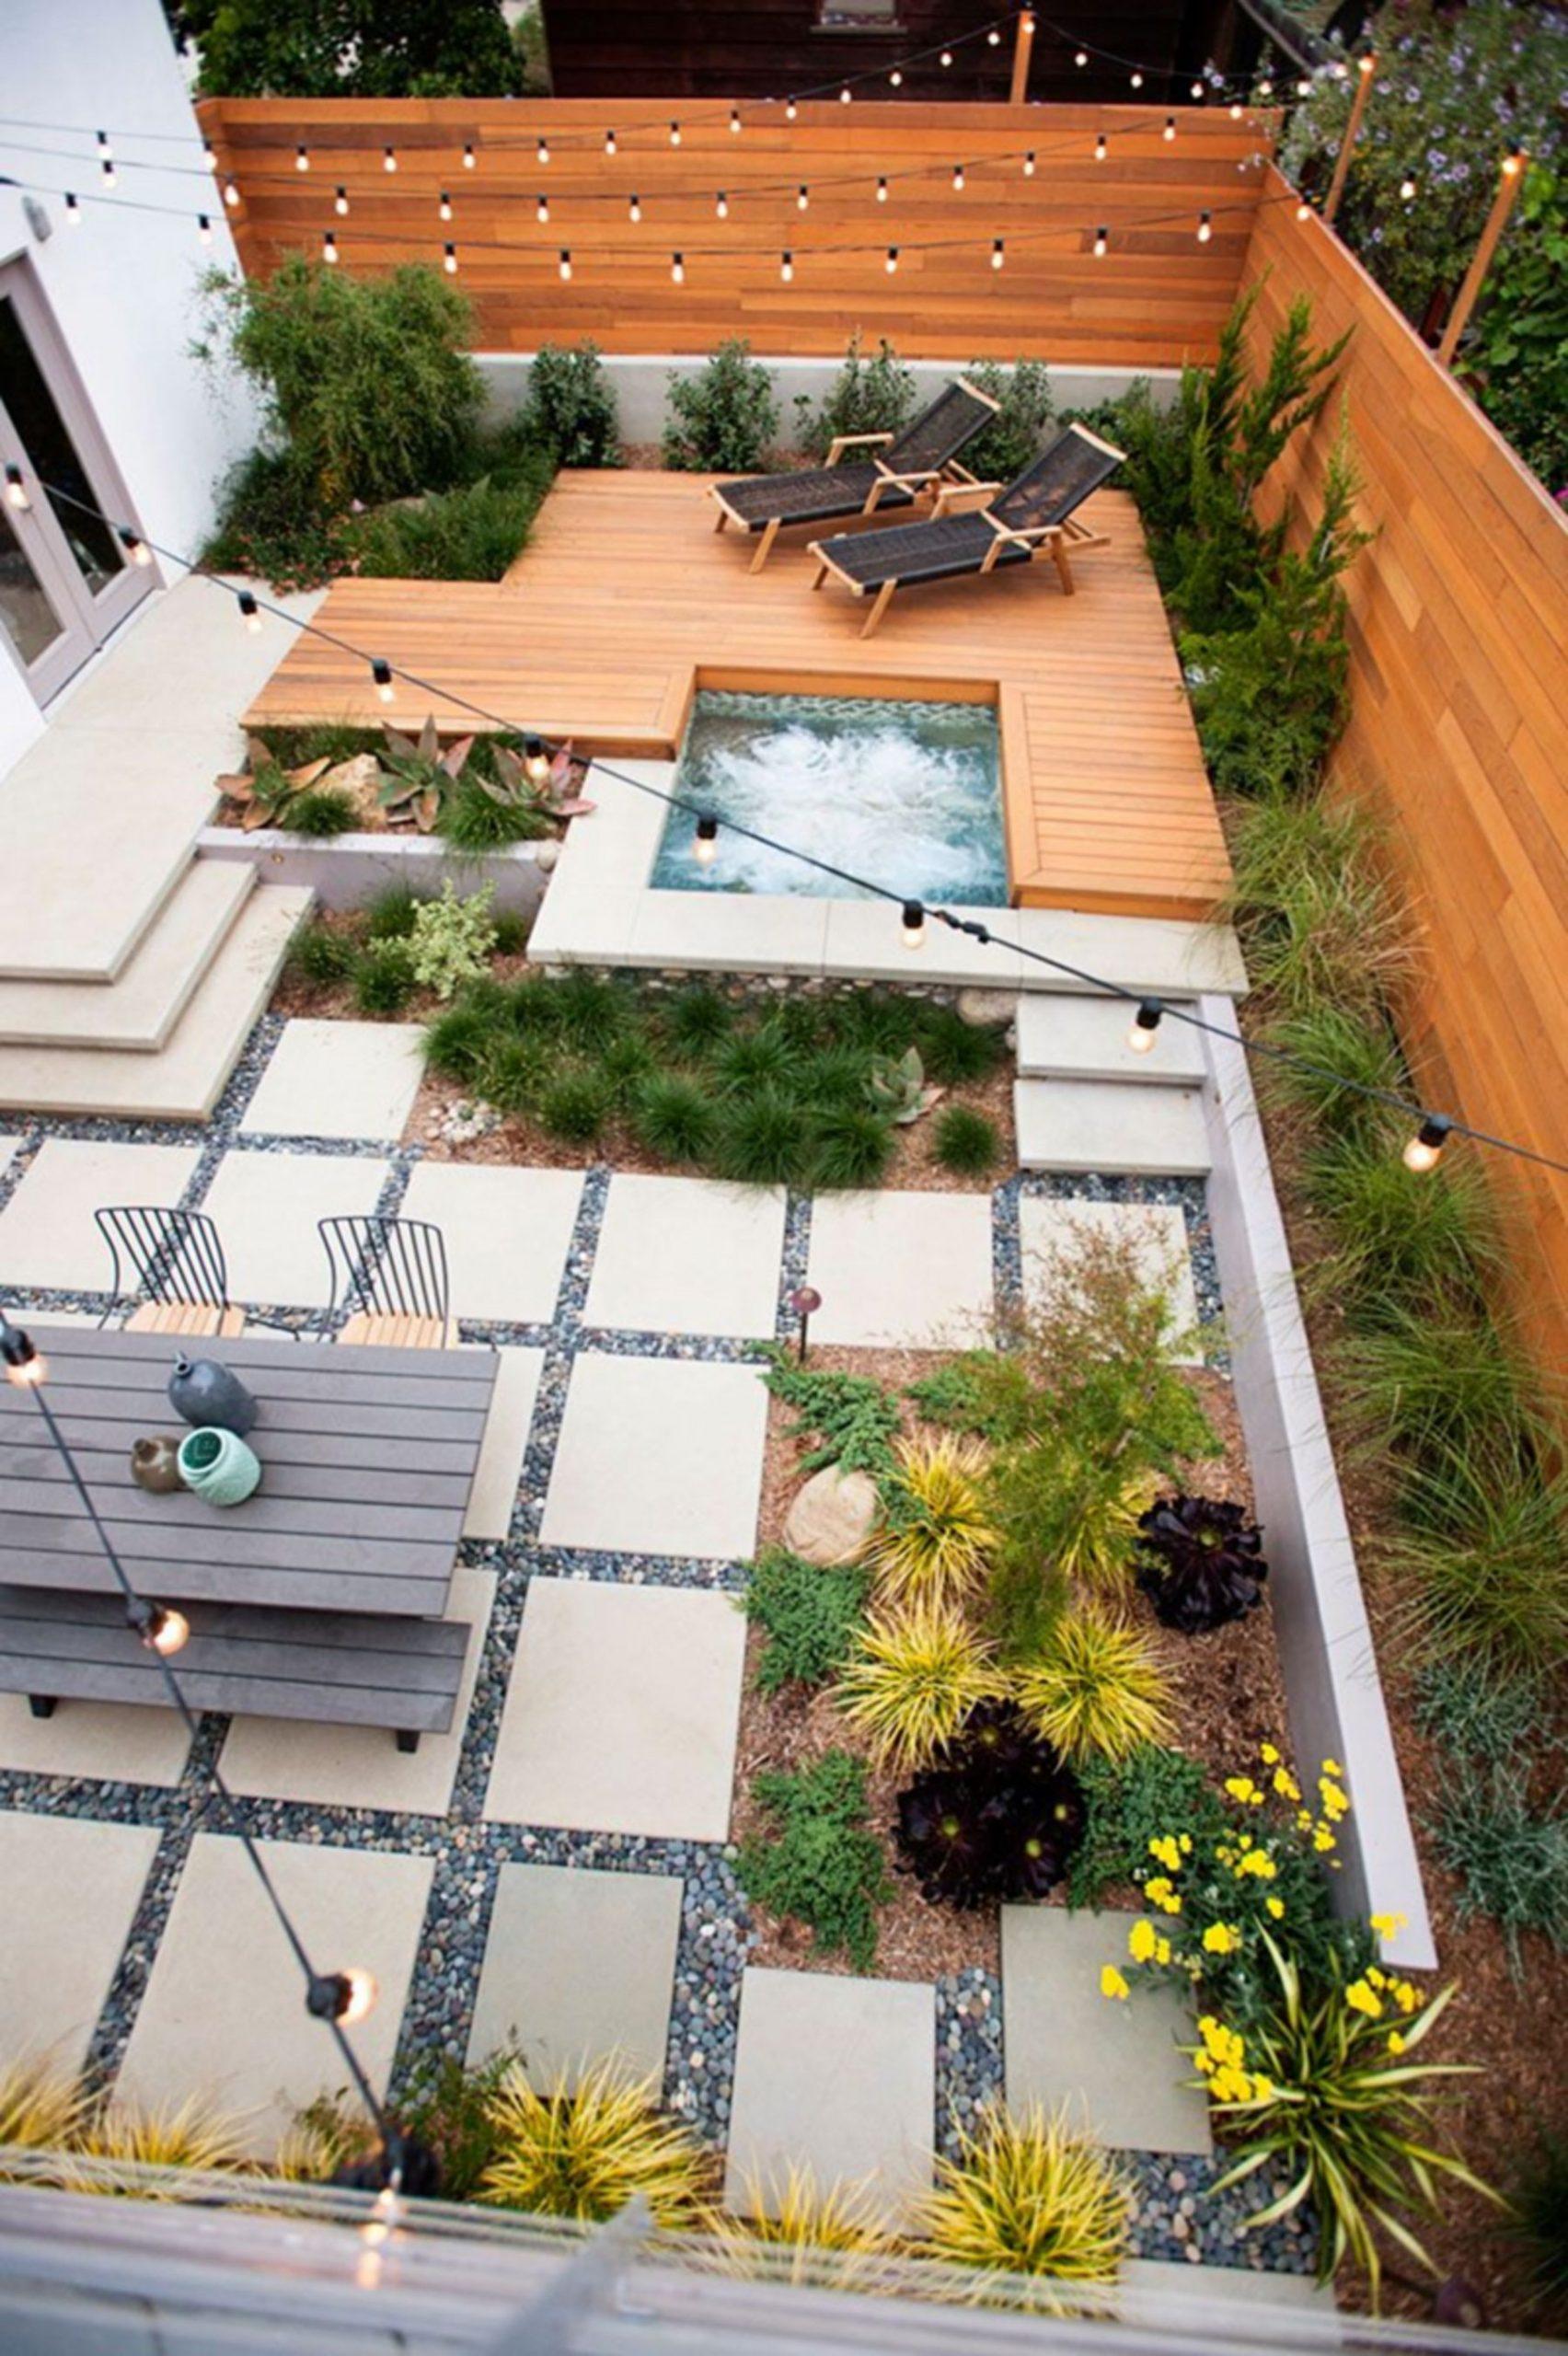 10+ Fantastic Urban Gardening Ideas For Your Backyard ... concernant Parterre Jardin Moderne